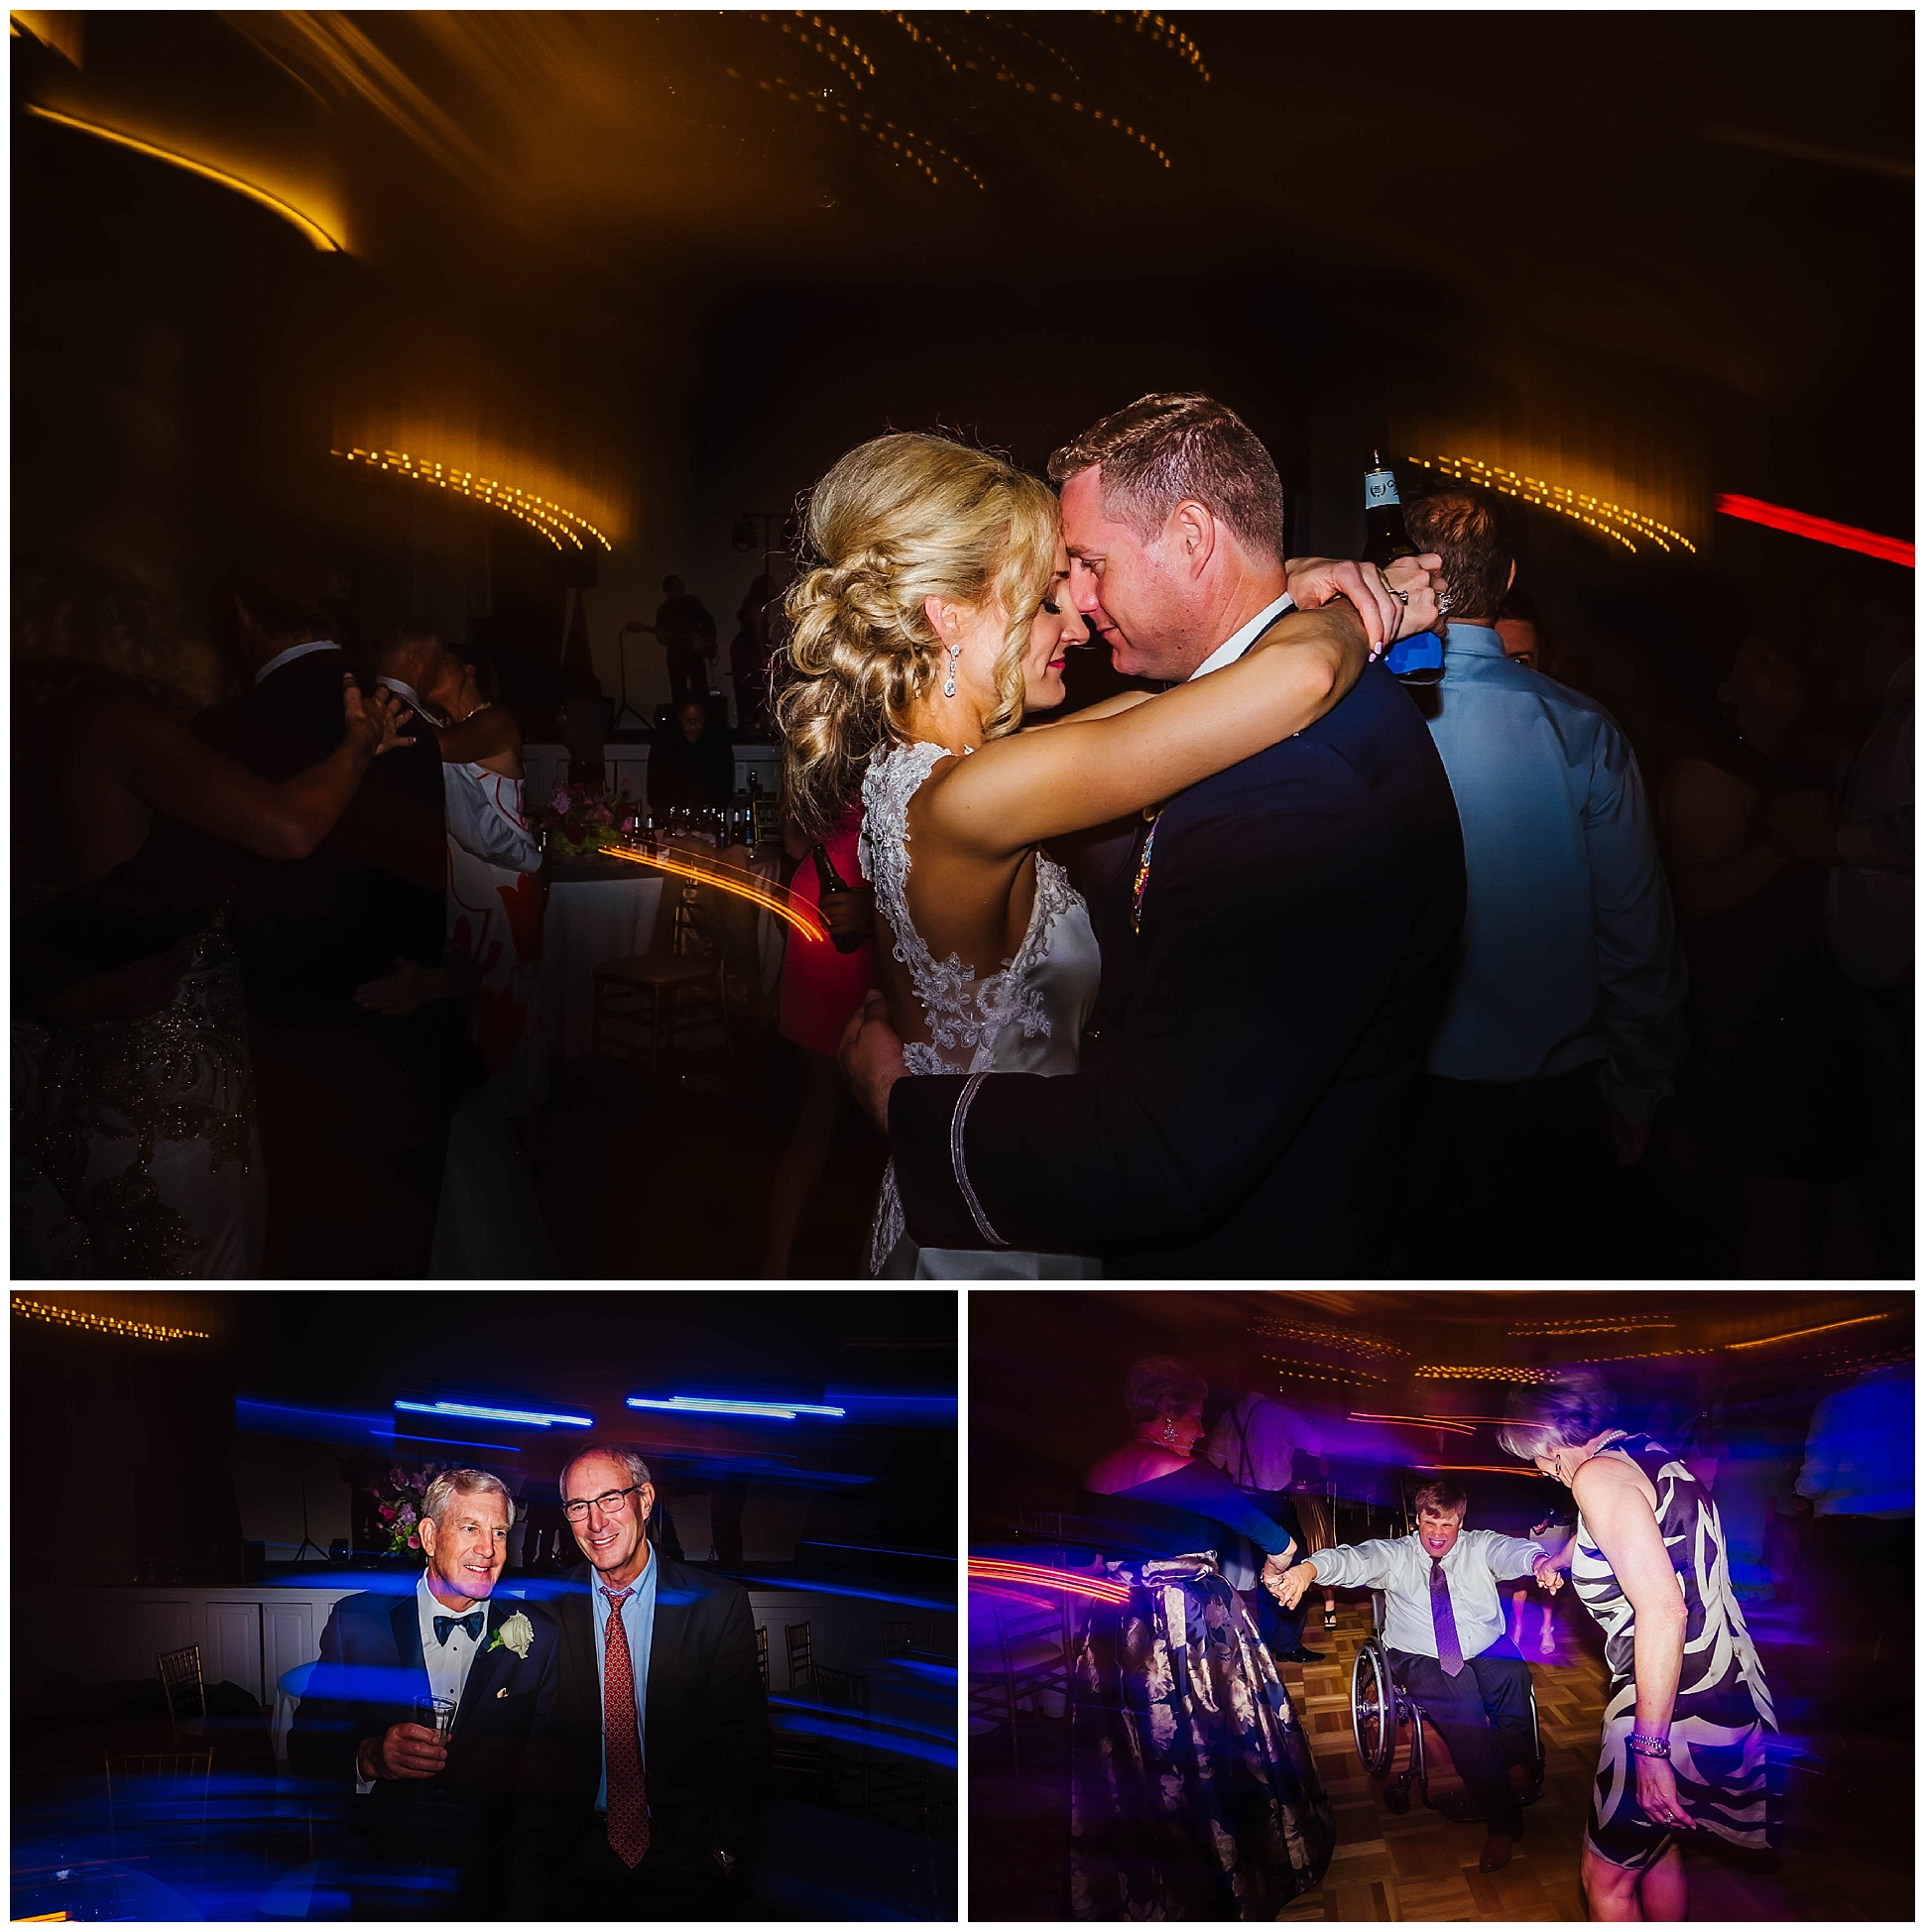 tampa-wedding-photographer-sleeves-palma-ceia-country-club-golf-course-sunset-luxury_0112.jpg